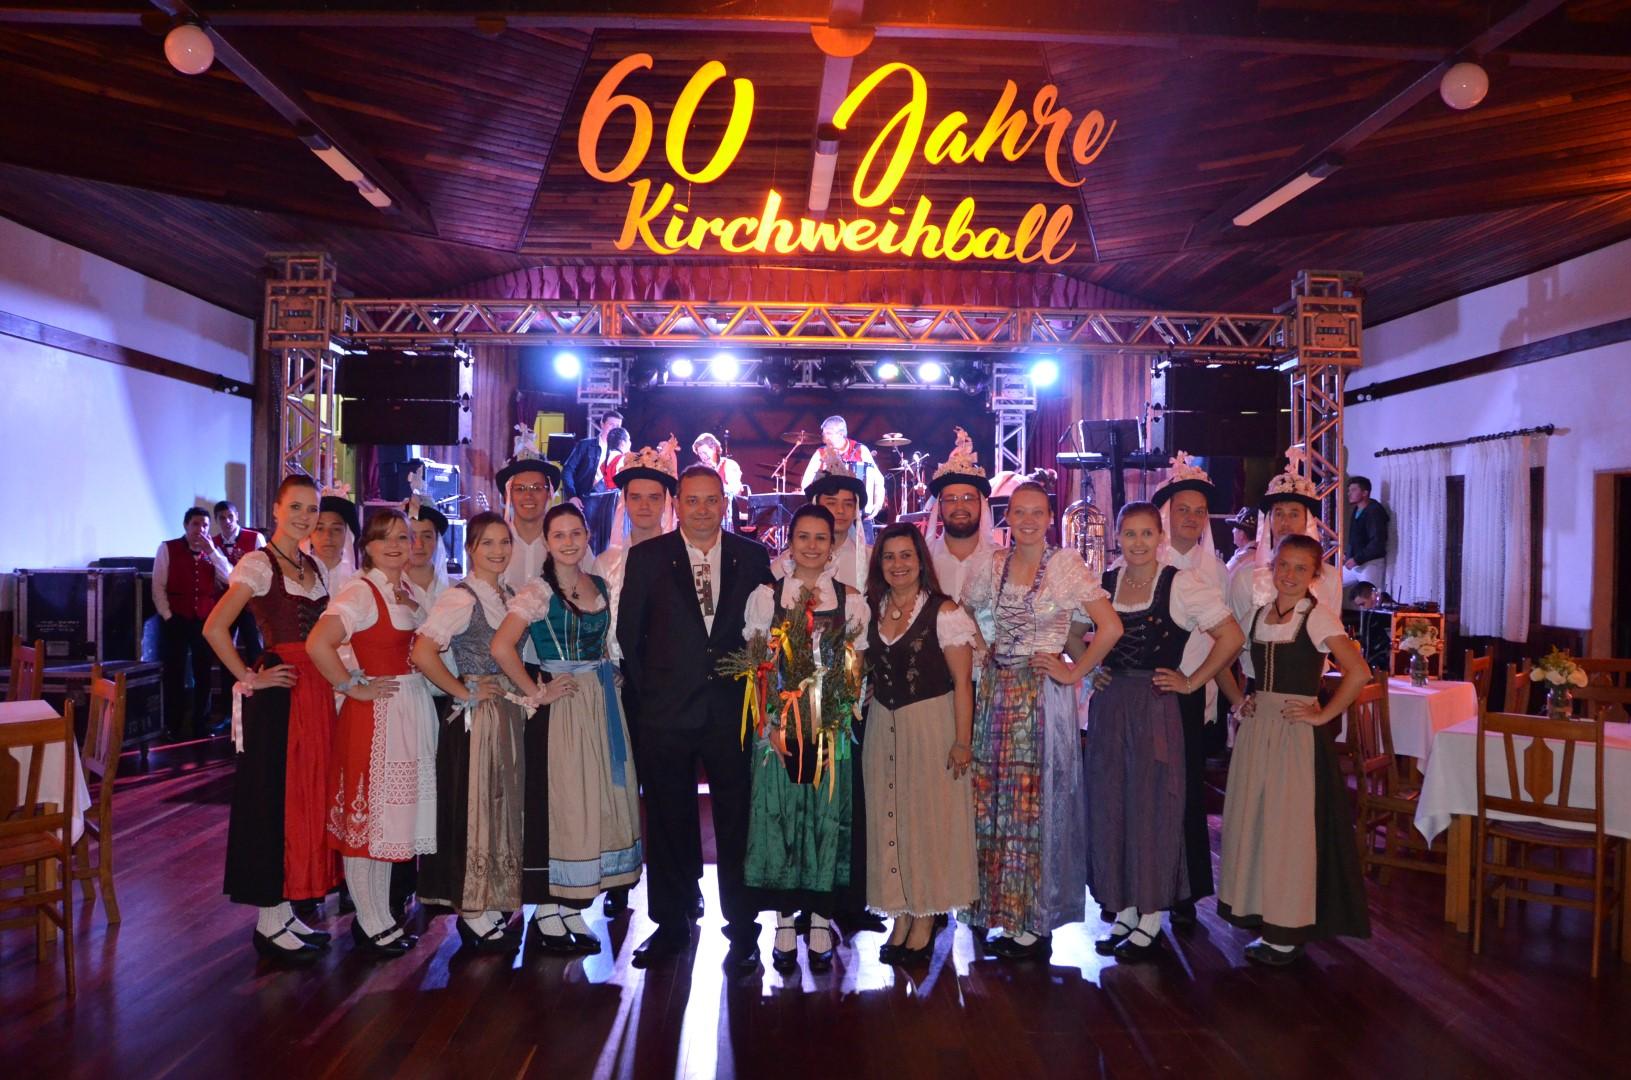 60 Jahre Kirchweihball - 19/08/201760 Jahre Kirchweihball - 19/08/2017